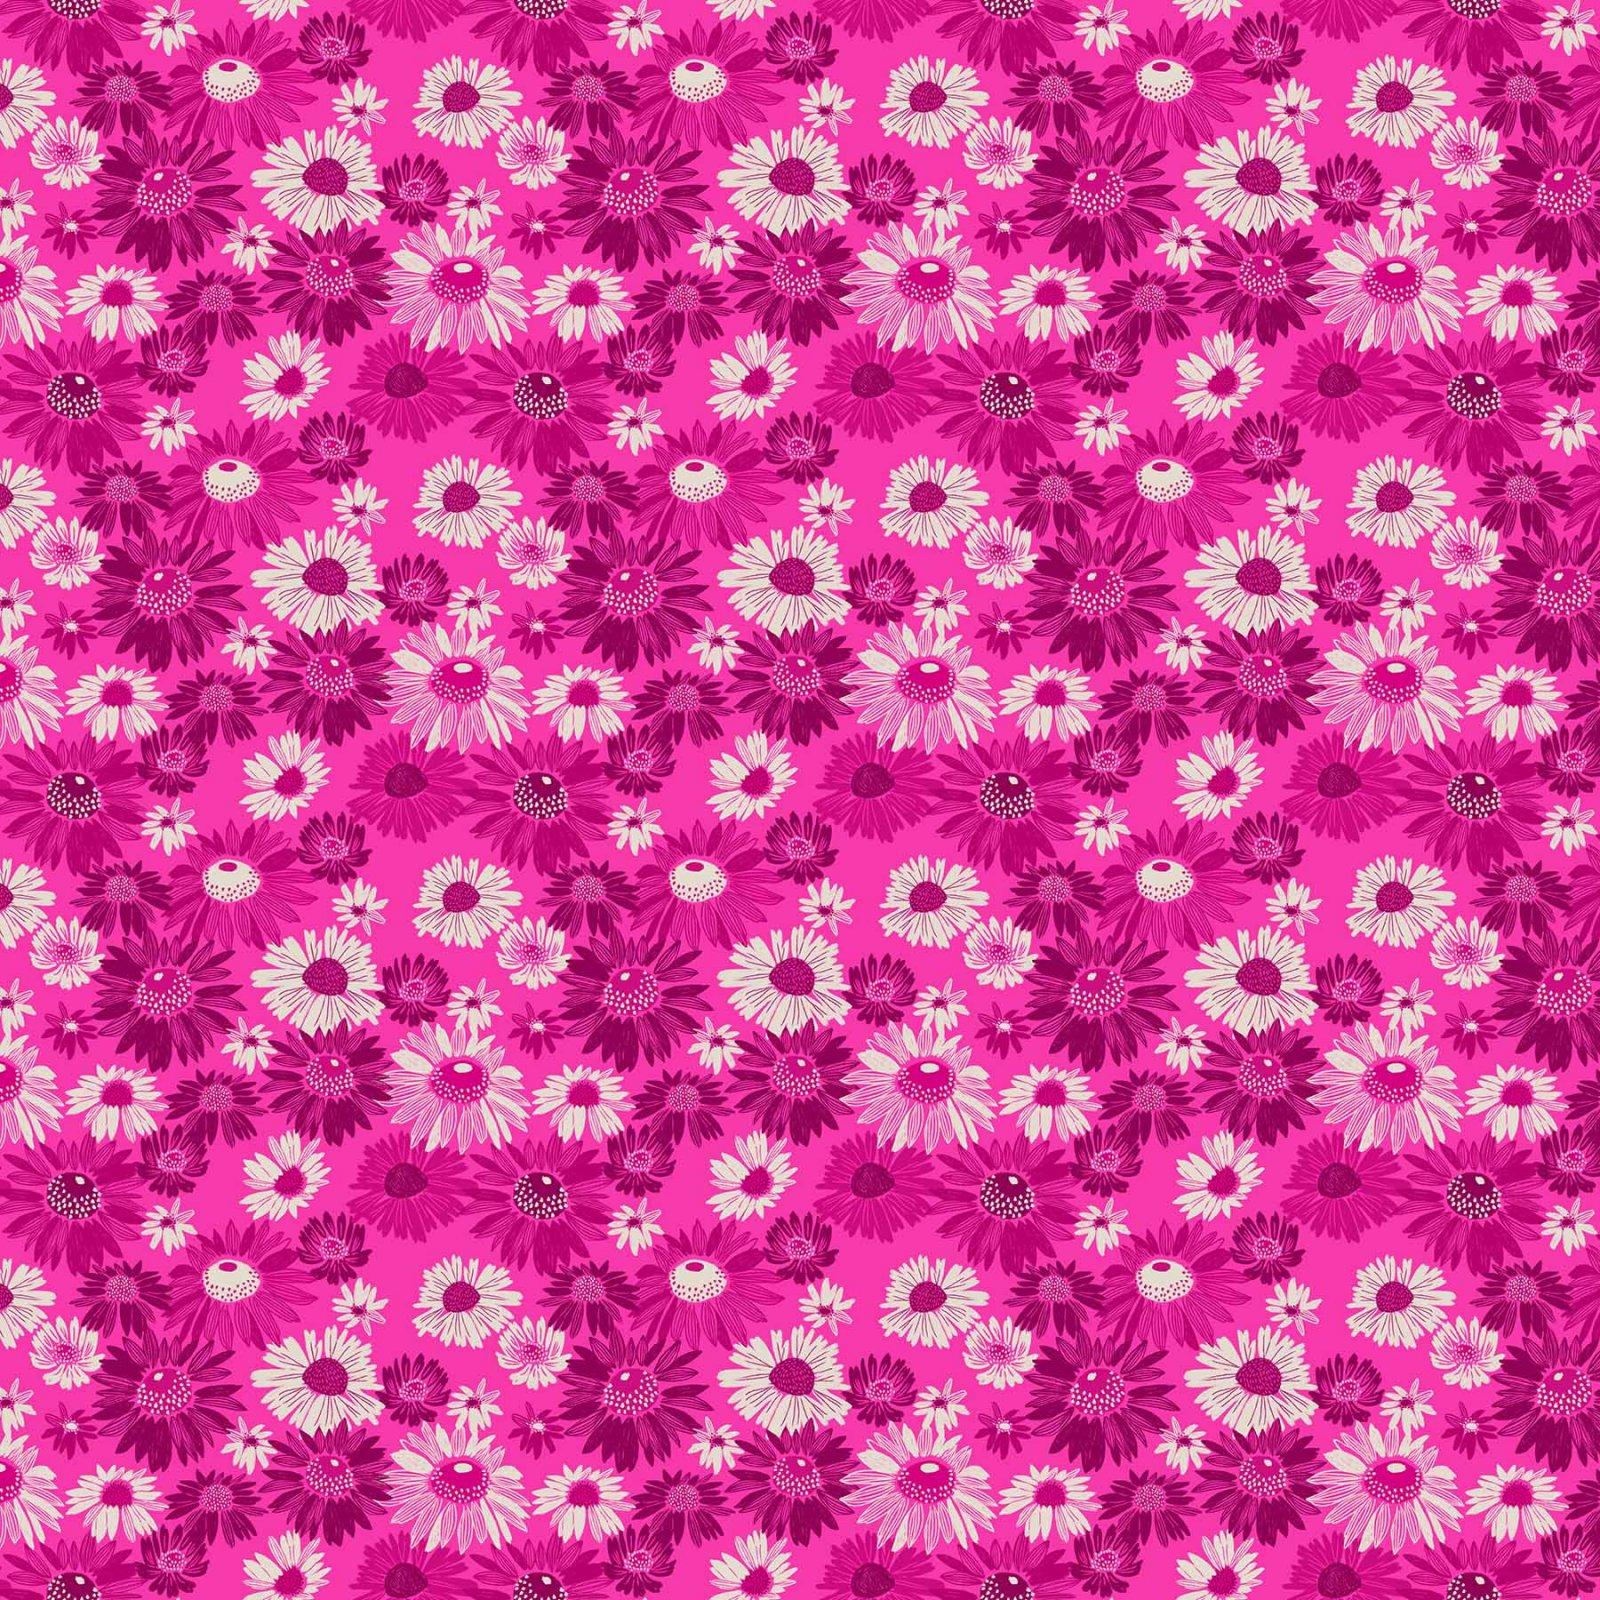 Flora 90146-28